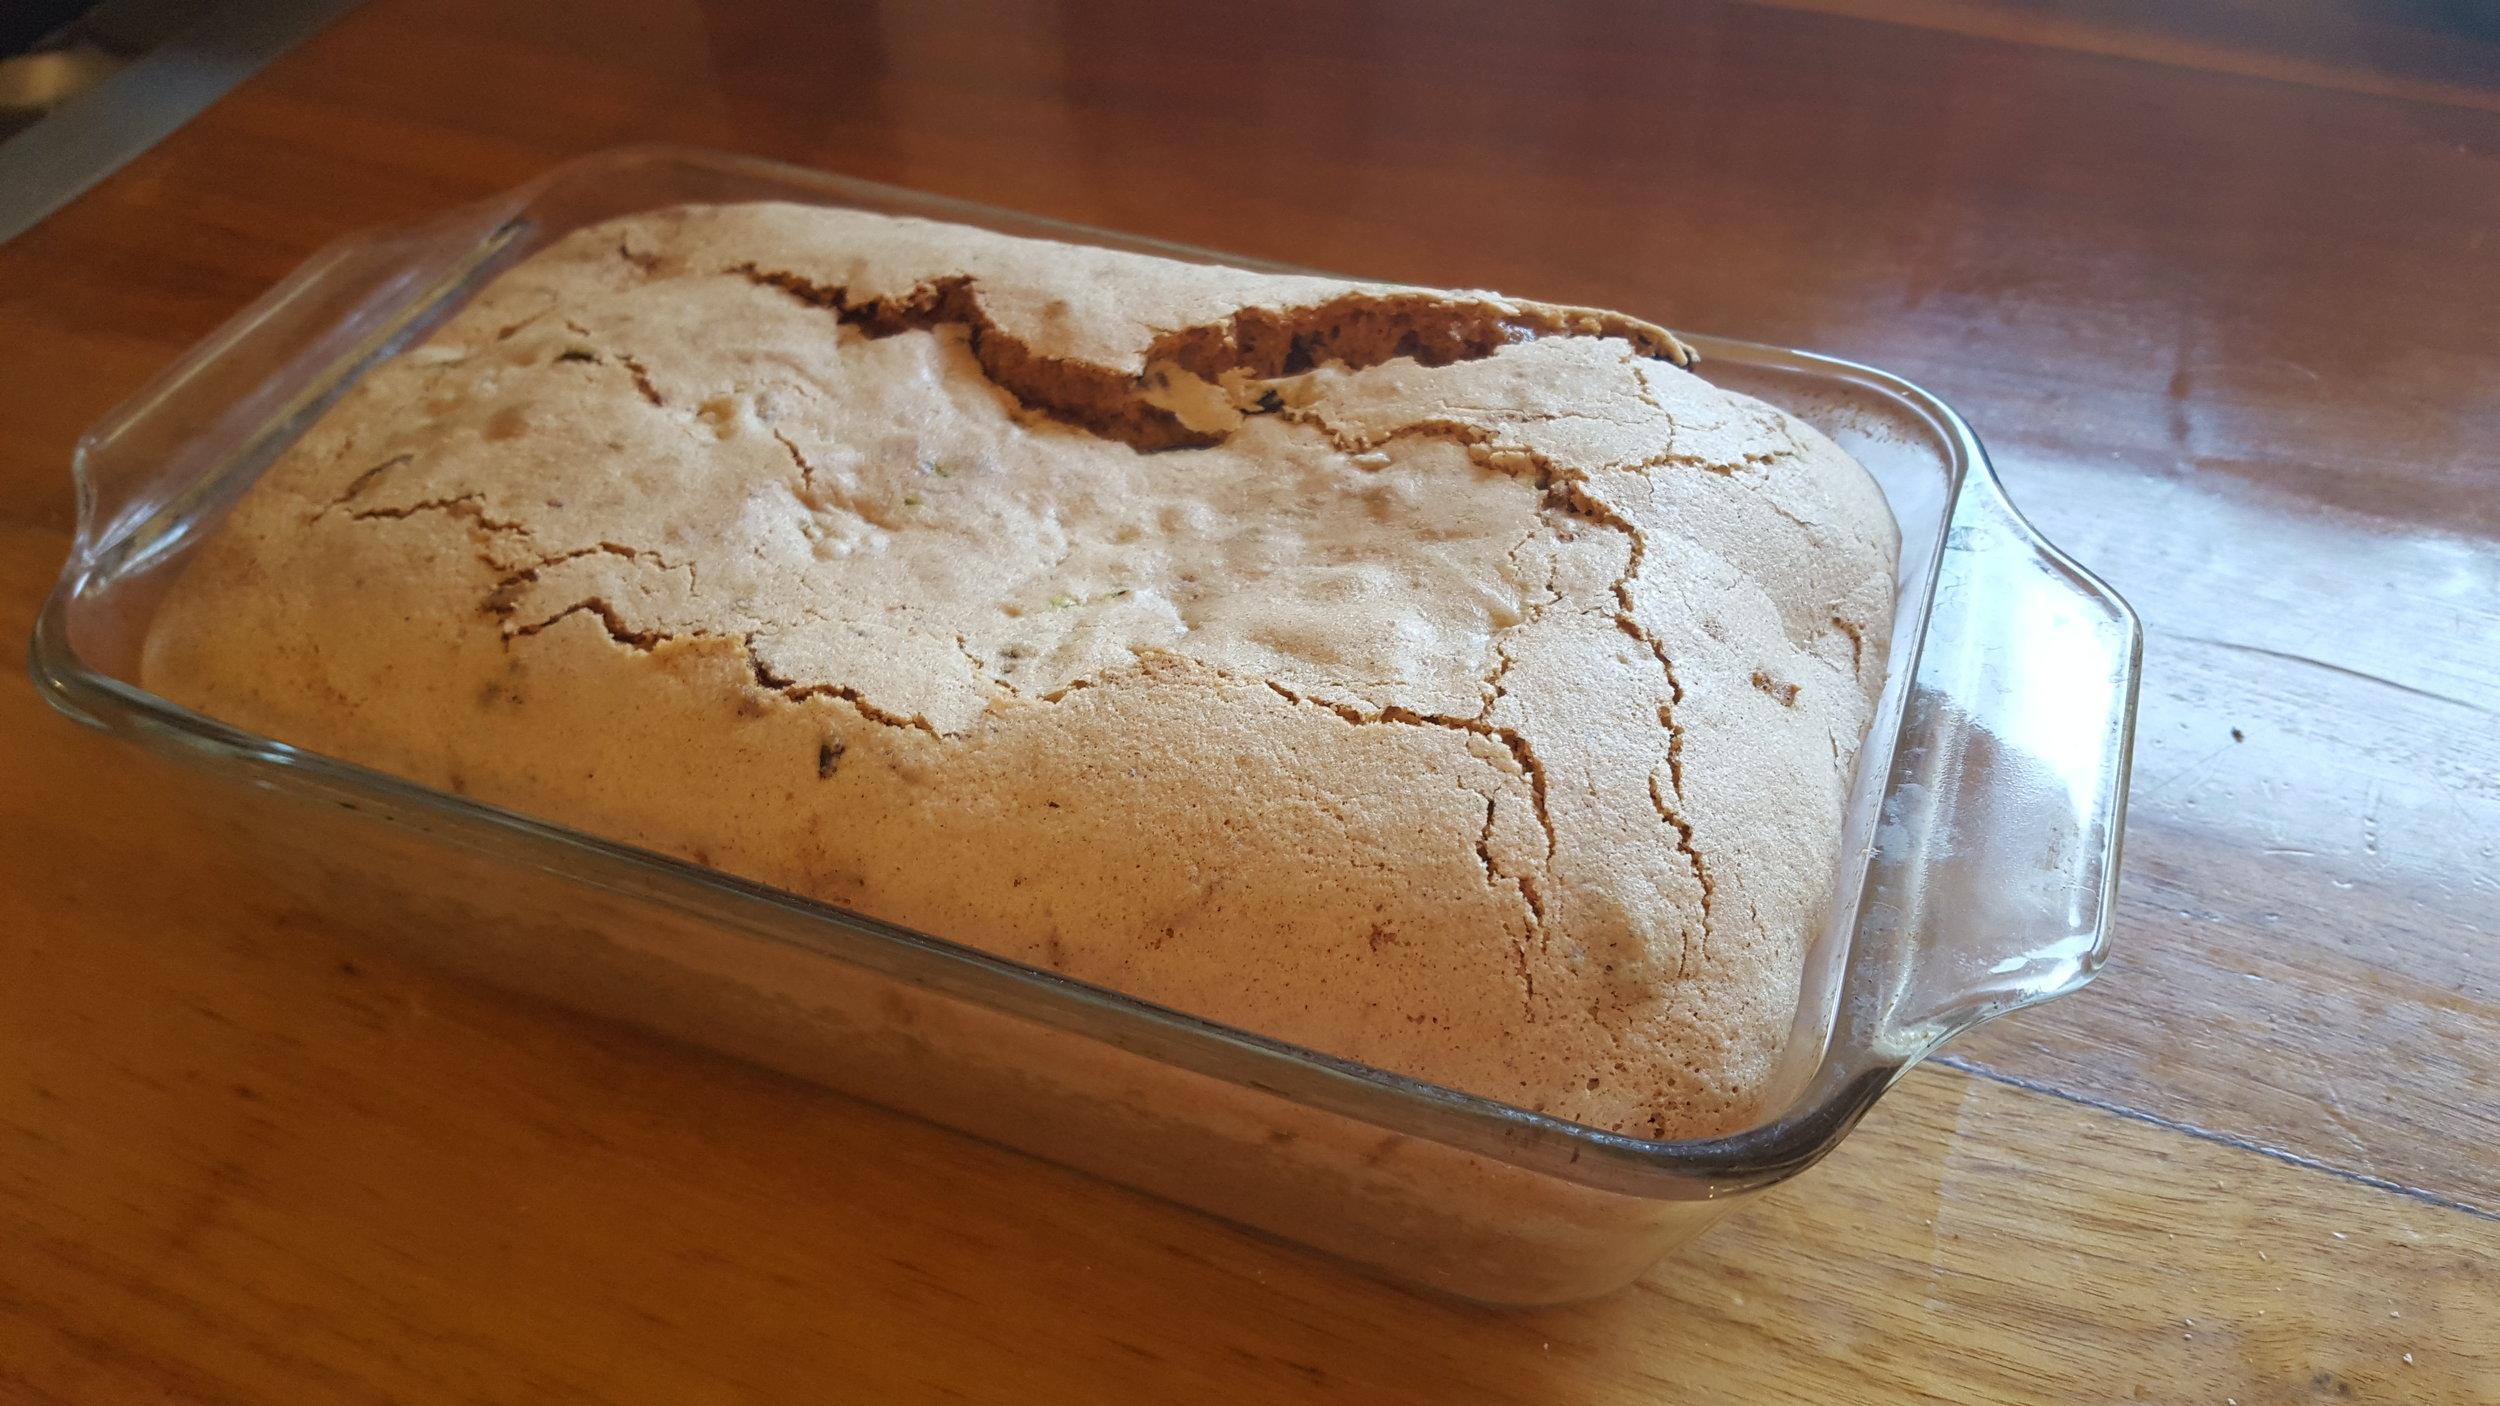 Northwest Pearls: Zucchini Bread